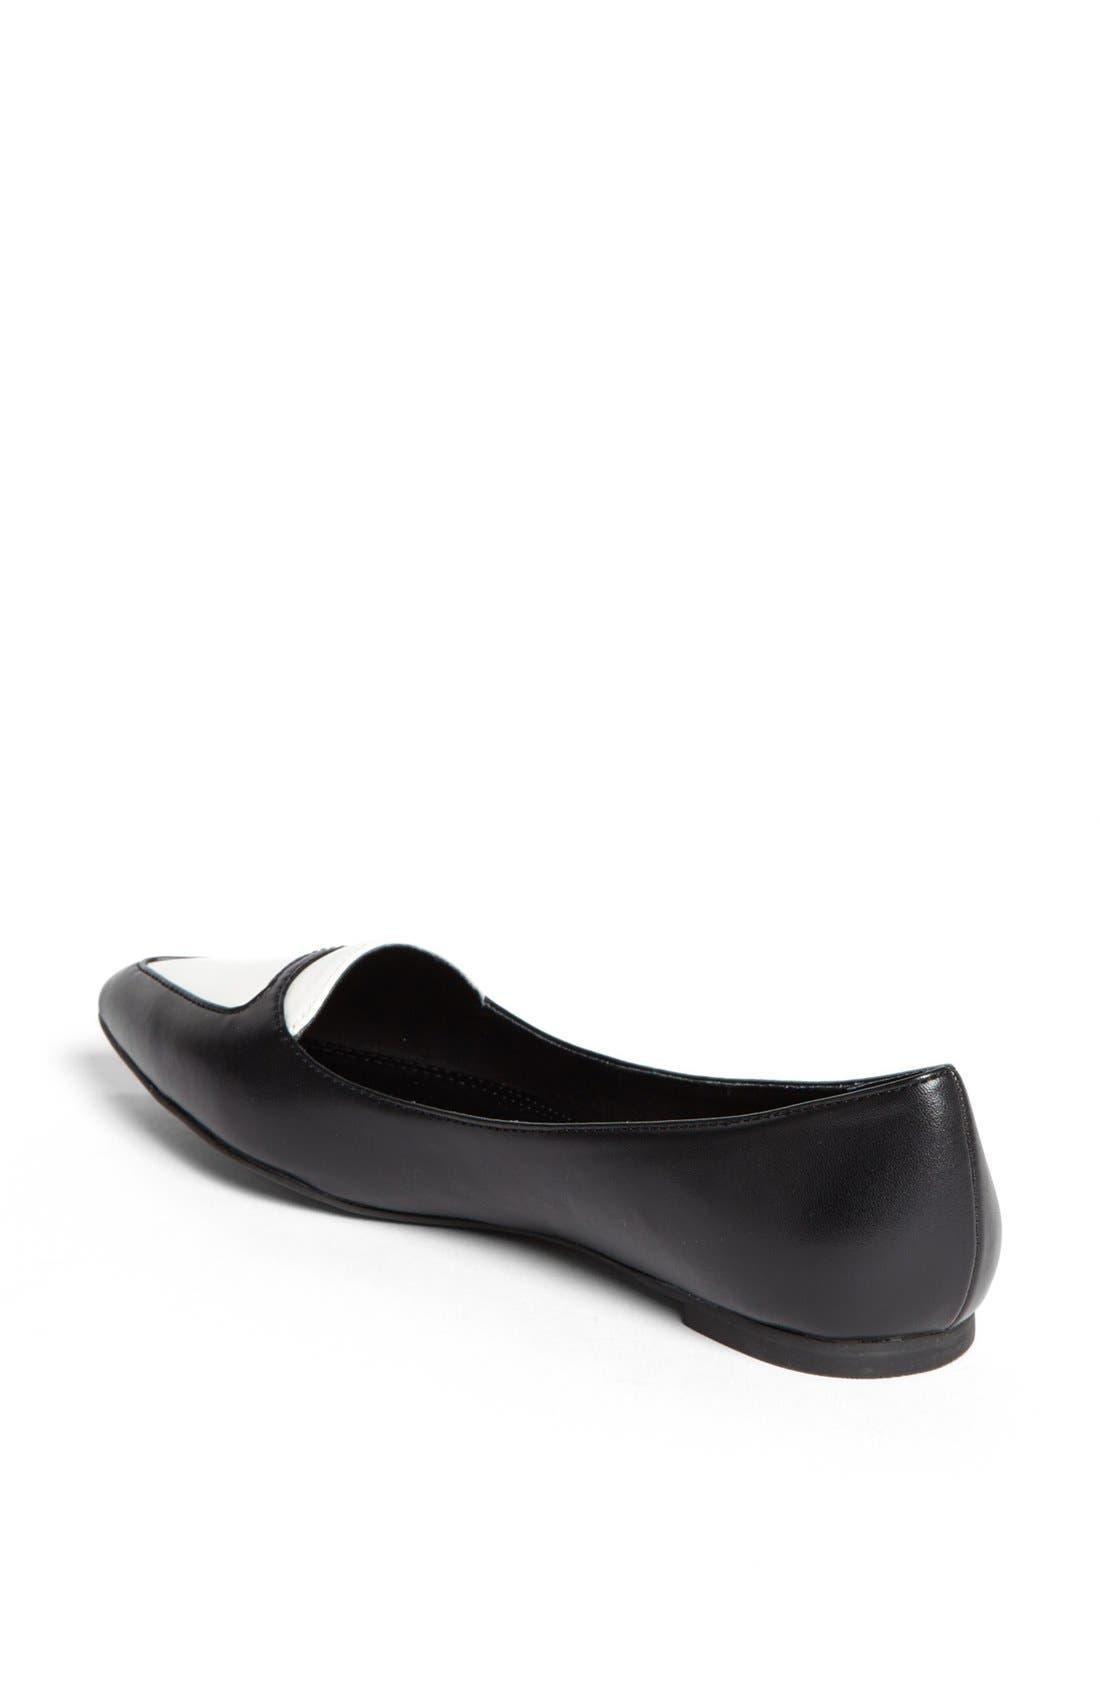 Alternate Image 2  - Tildon 'Naples' Pointy Toe Flat